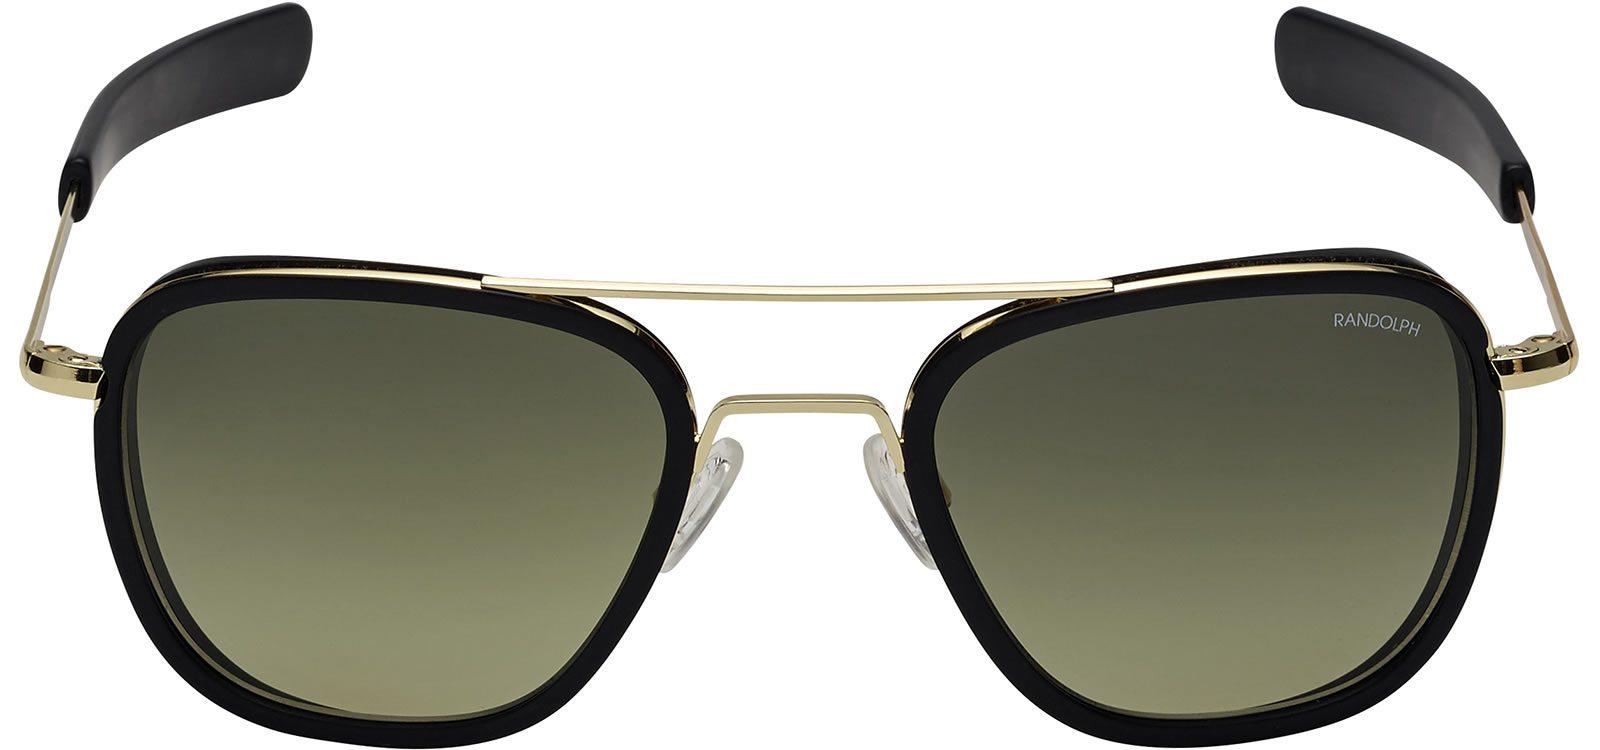 a36cc1a52b9 Randolph Aviator AI004 Gold 23K Green Gradient 58mm Sonnenbrillen von Randolph  Engineering   1 + ...